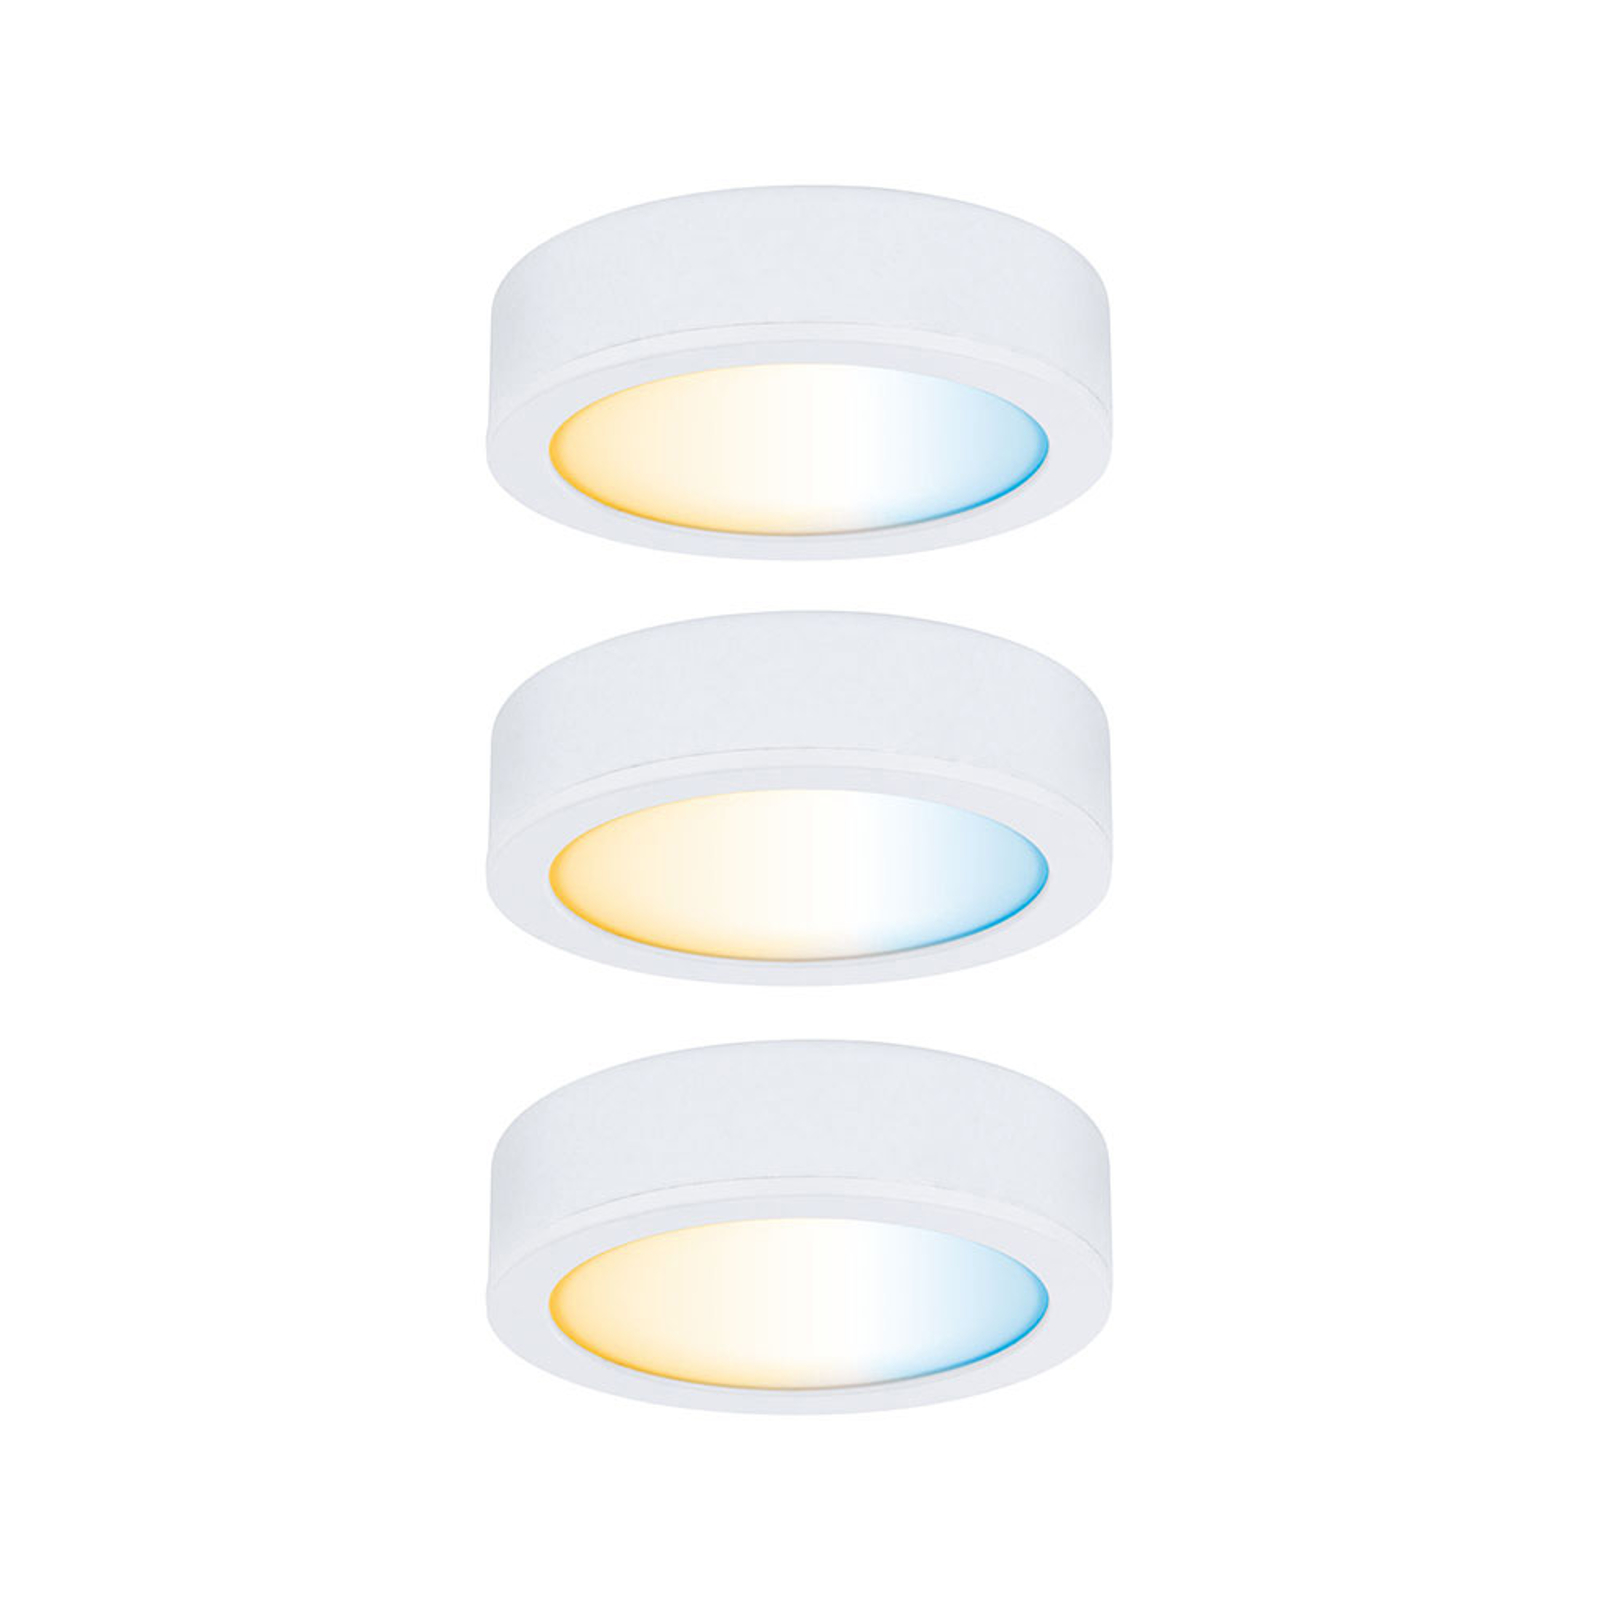 Paulmann Clever Connect Disc lampa do mebli 3 szt.